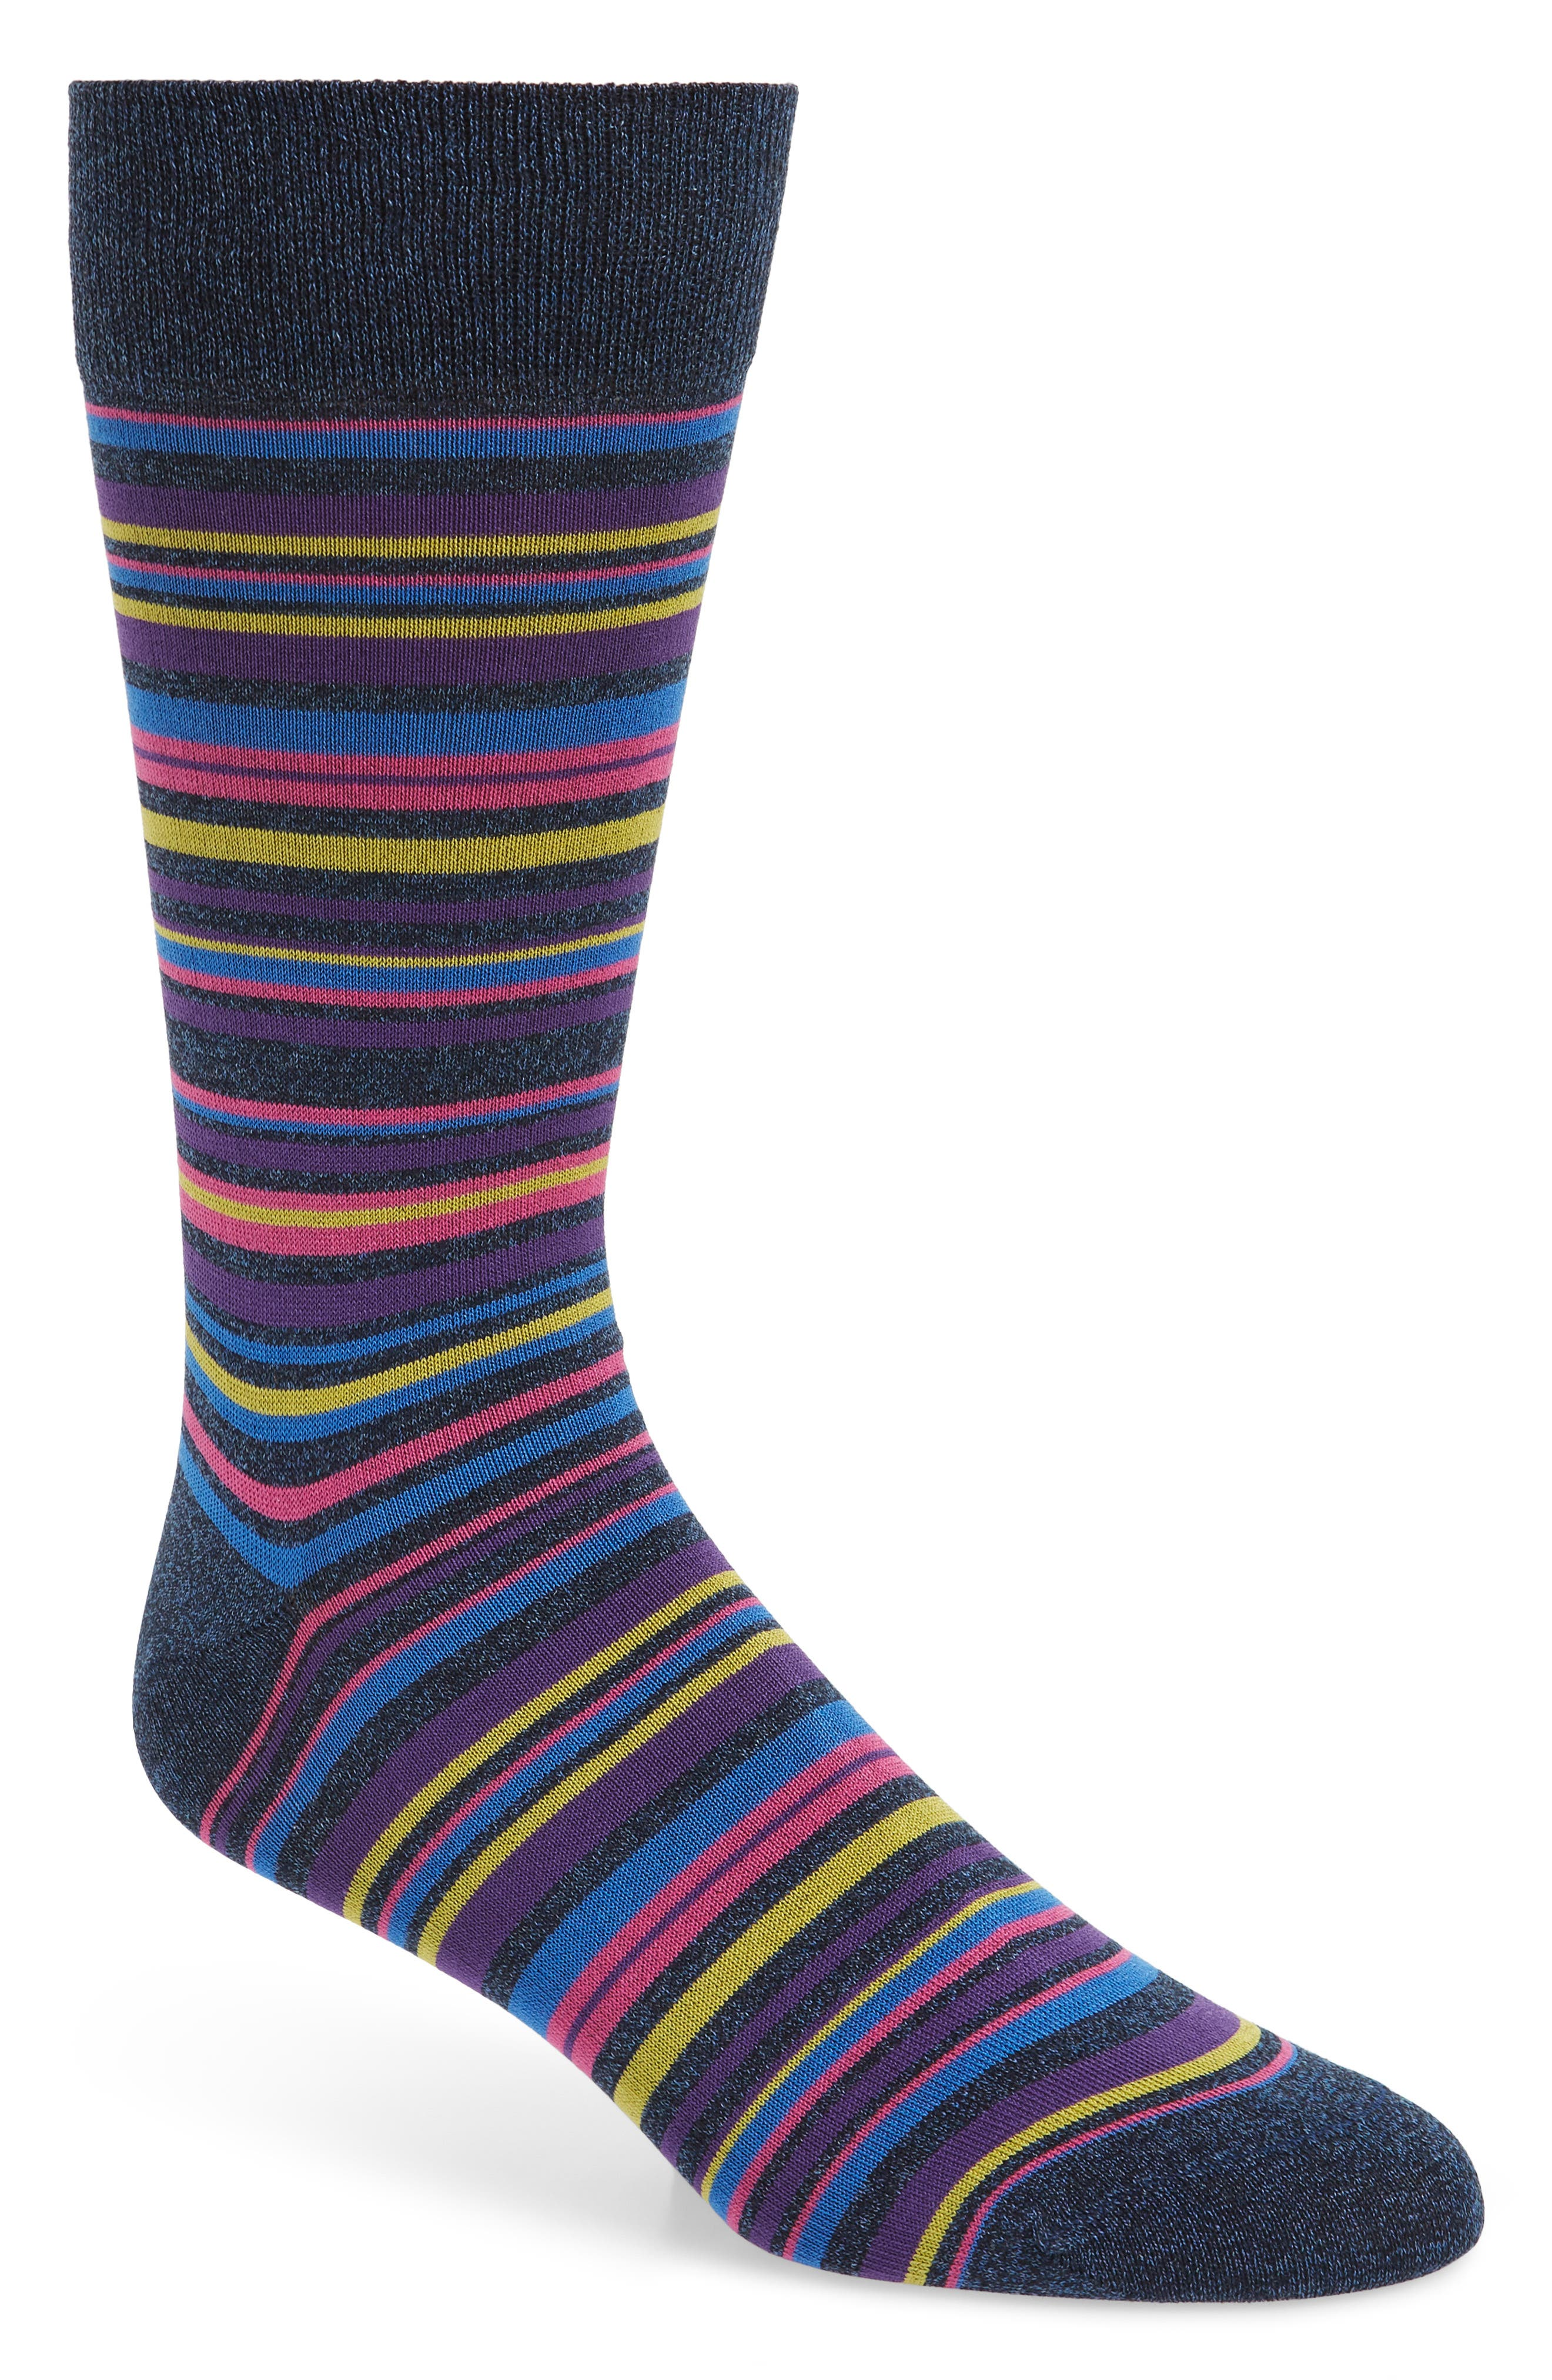 Cotton Blend Socks,                             Main thumbnail 1, color,                             408